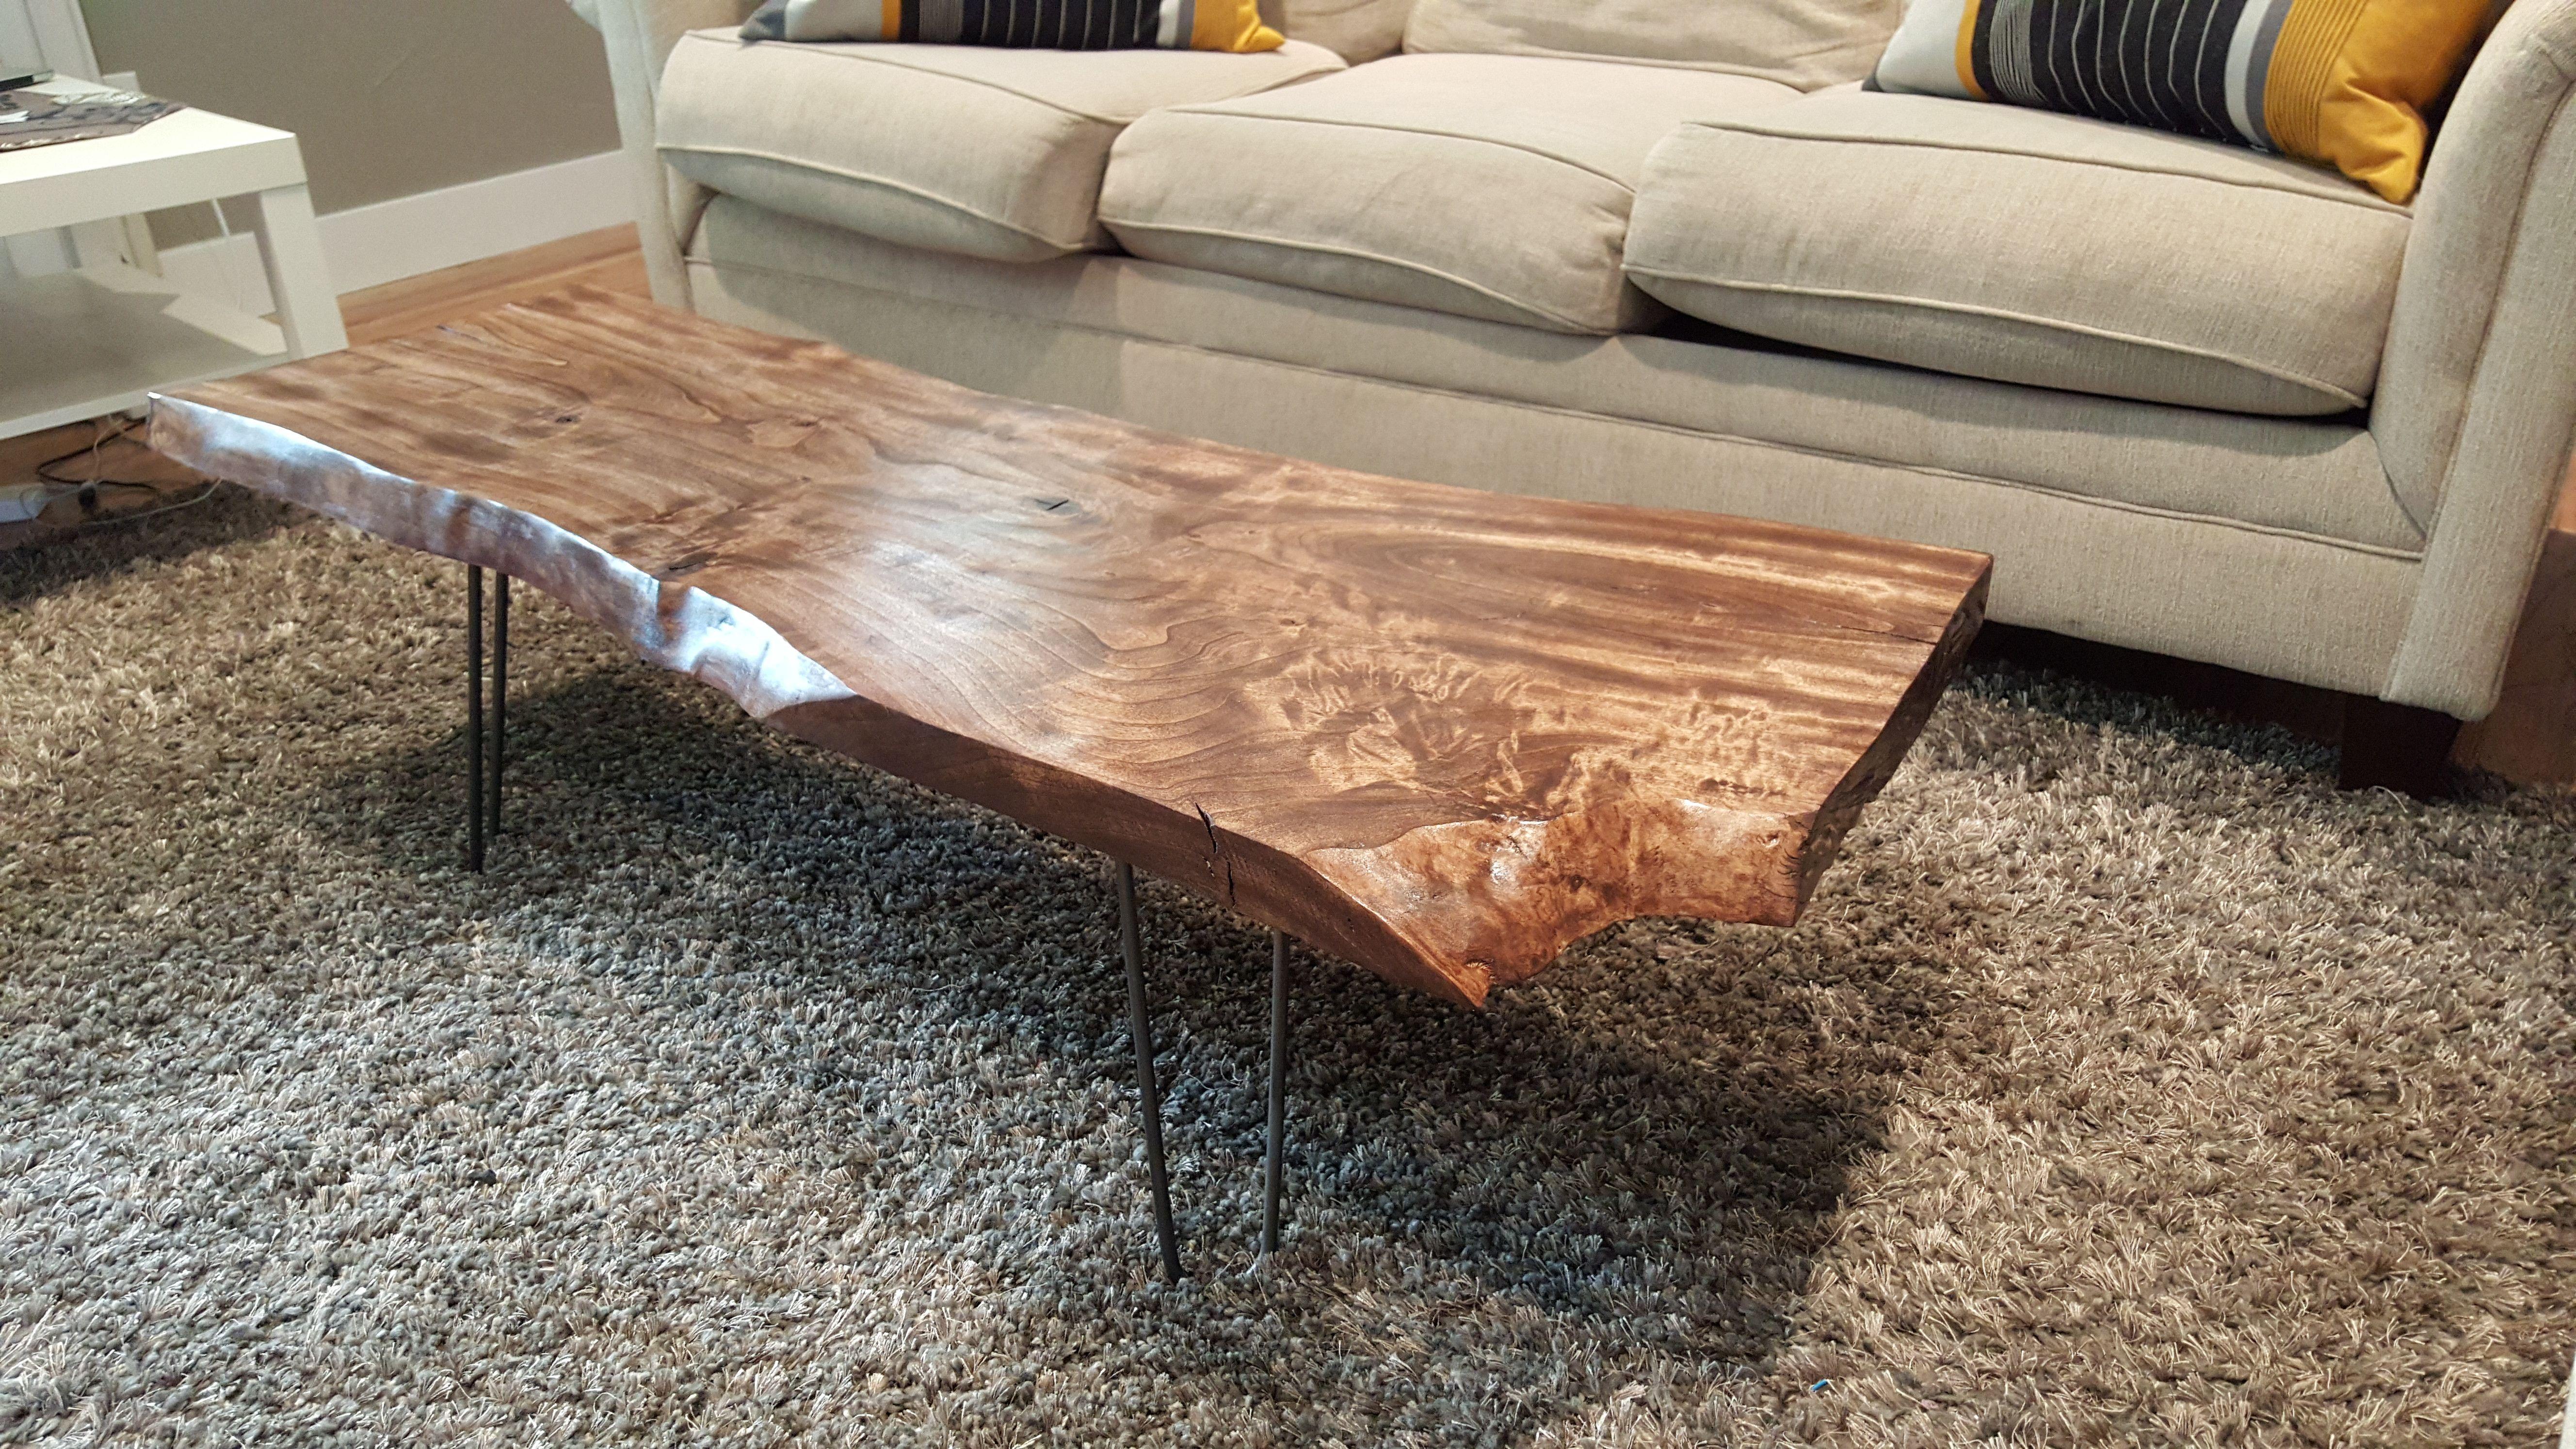 Diy raw edge wood coffee table